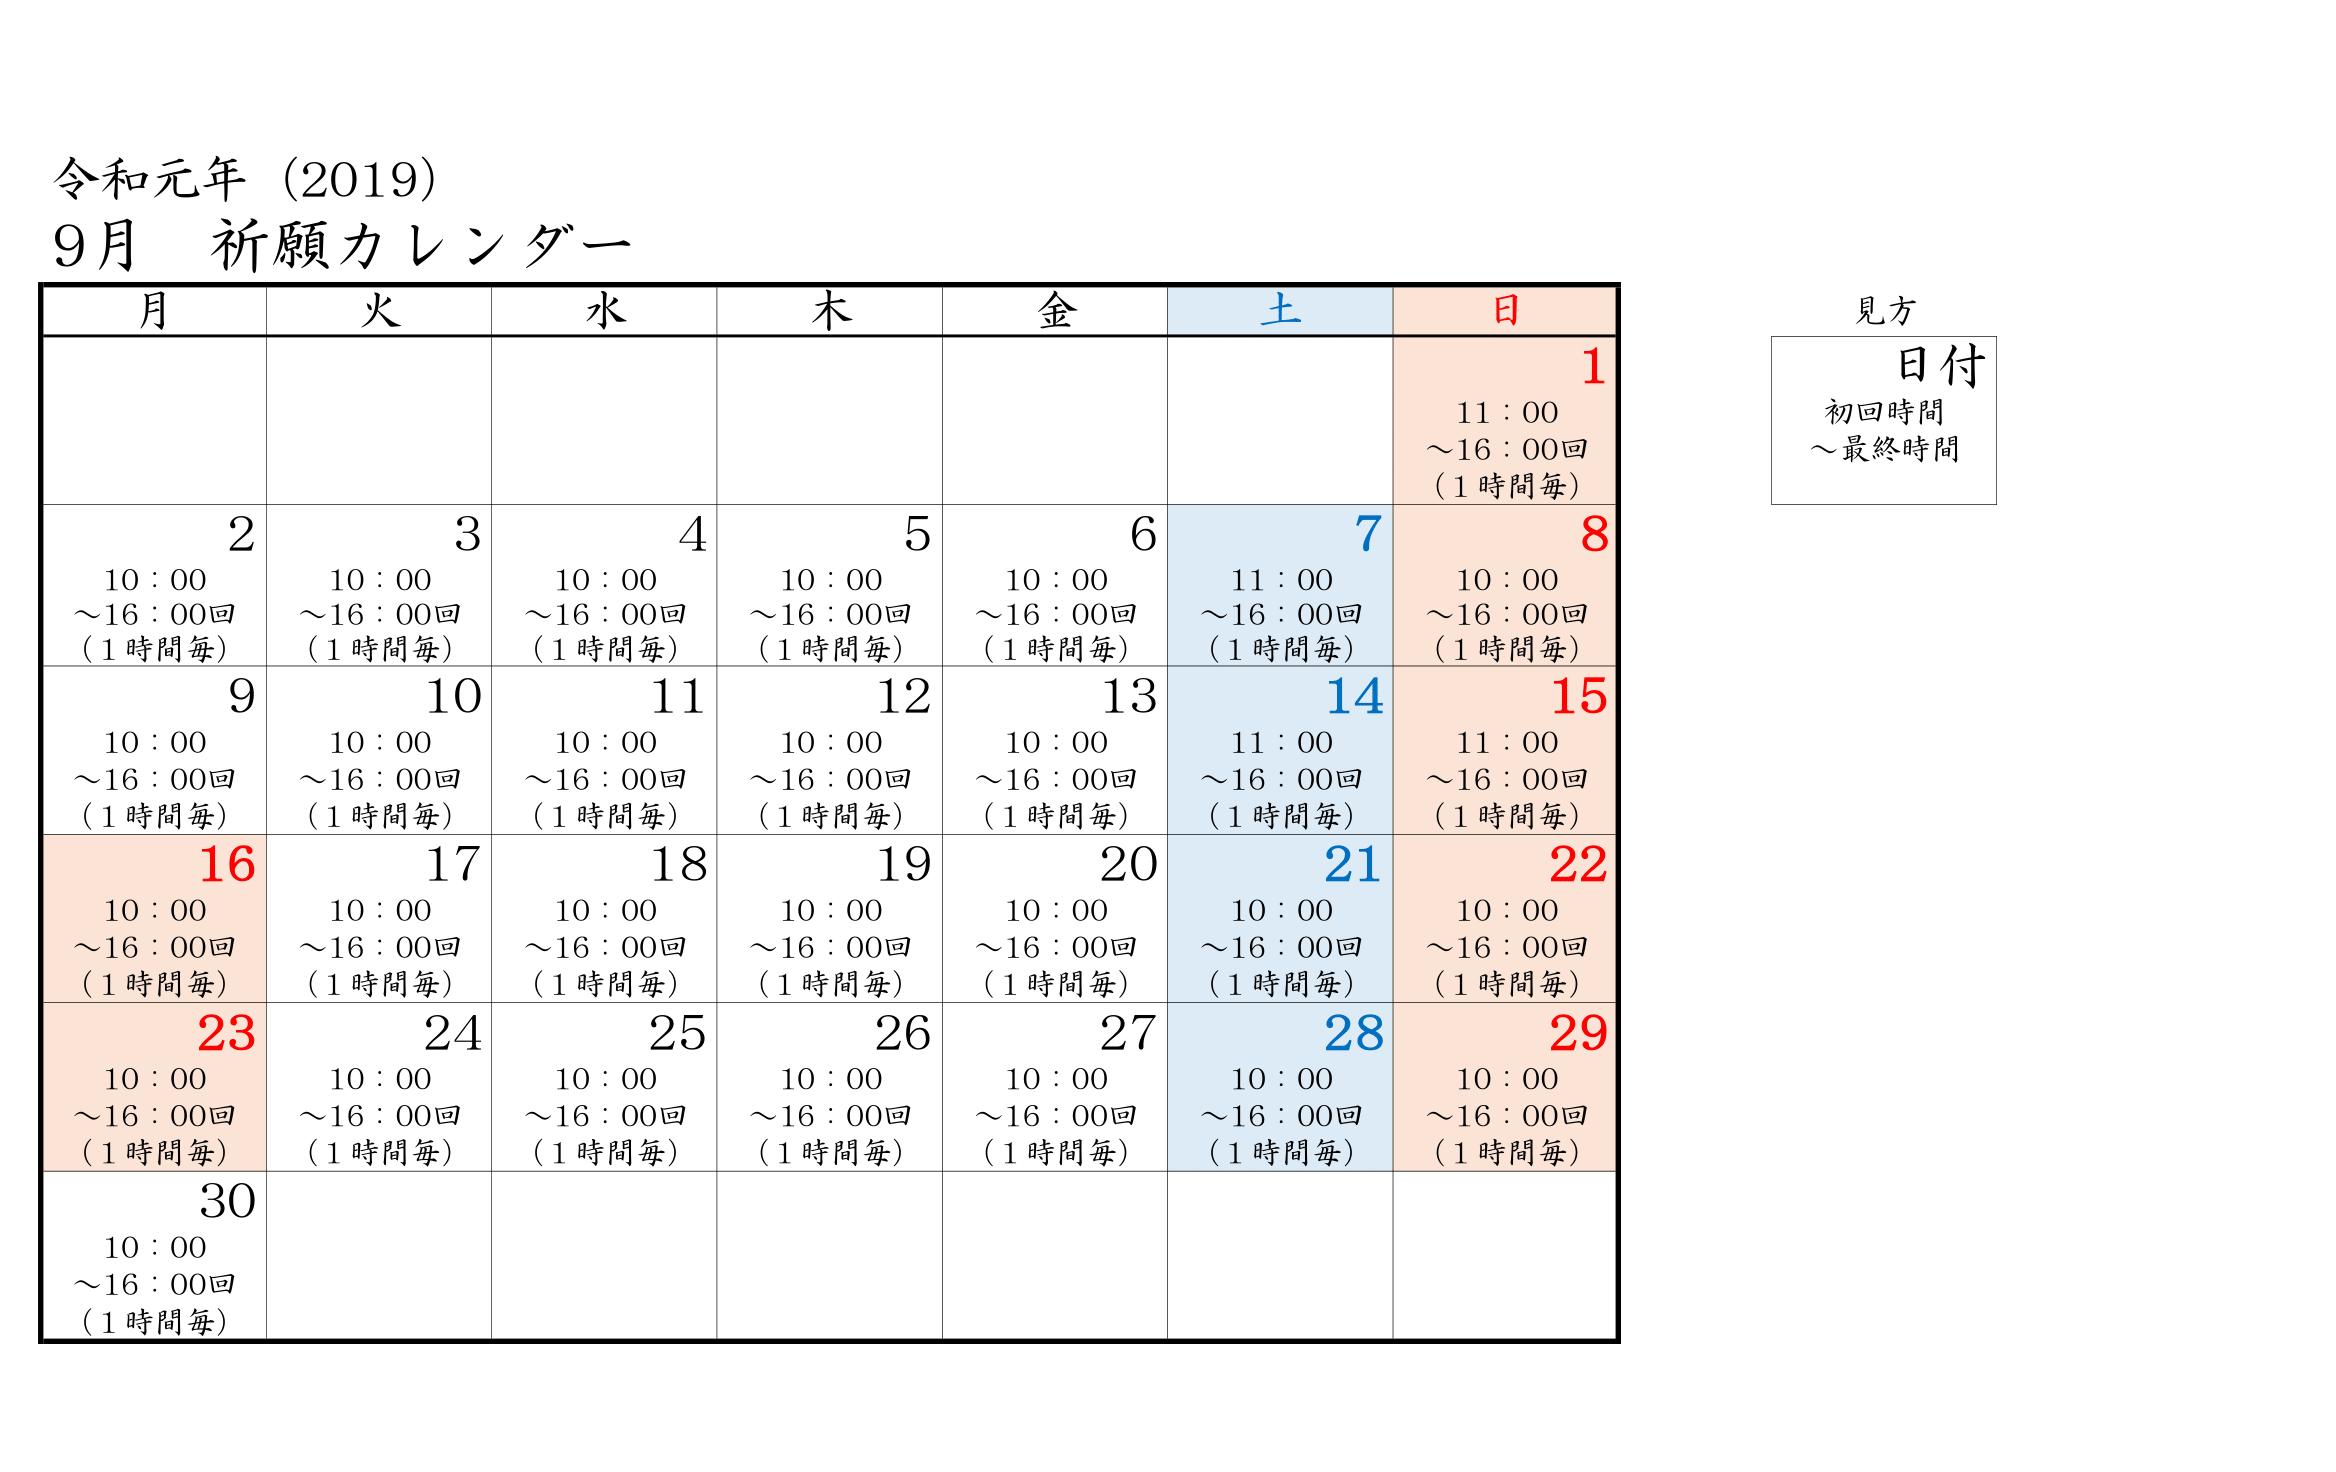 R1.09 七五三 予約カレンダー-1.png